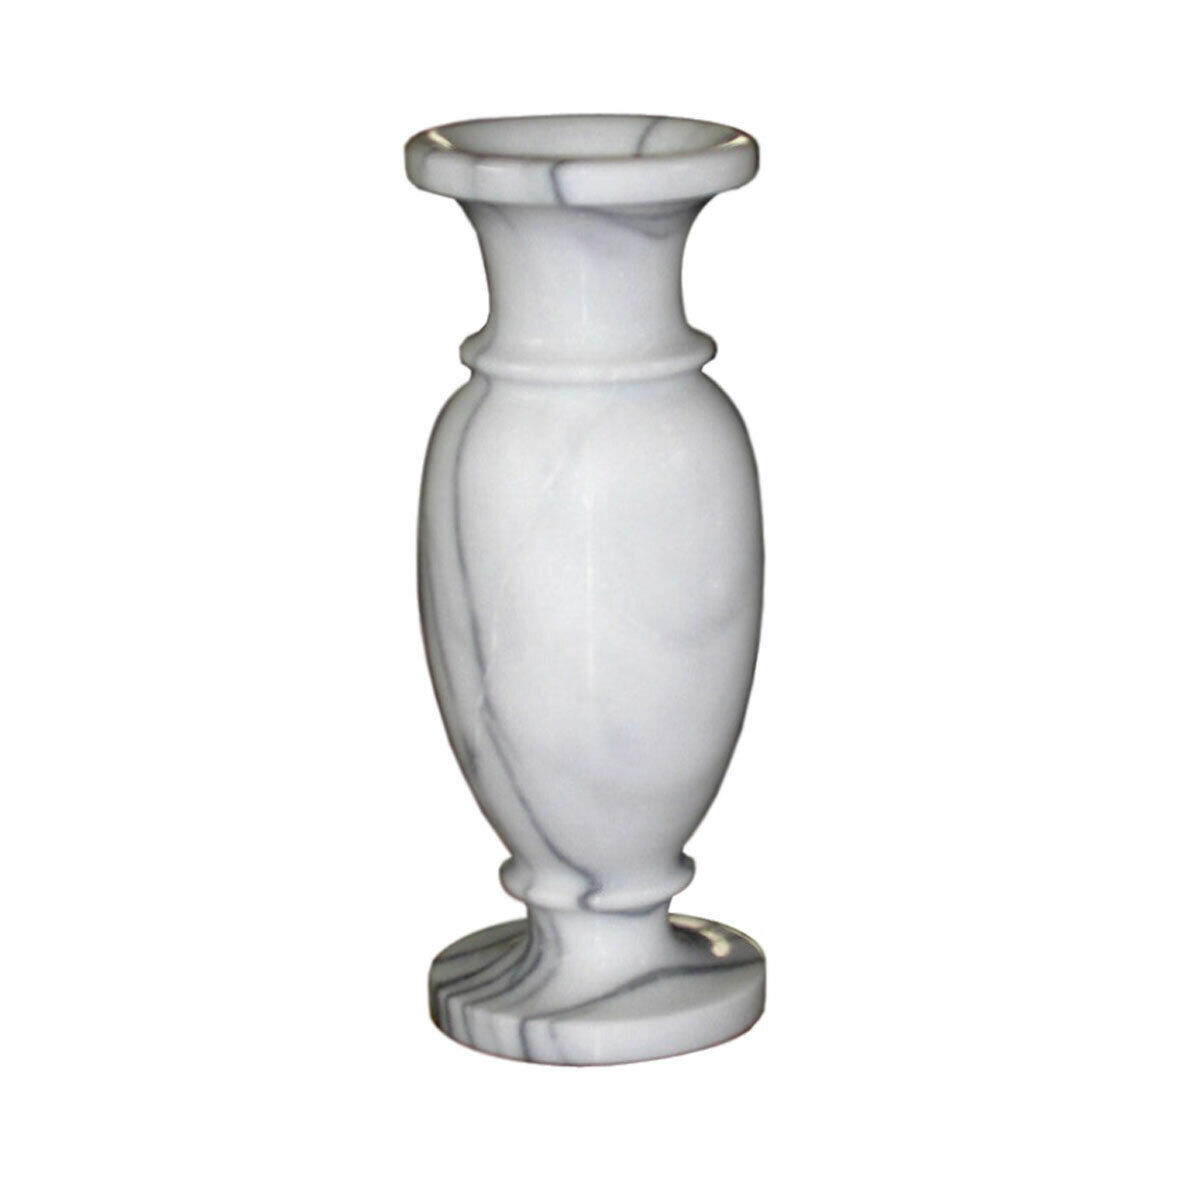 Vaso Marmo Portafiori Stile Classico Vintage Centerpiece Weiß Marble Vase H33cm